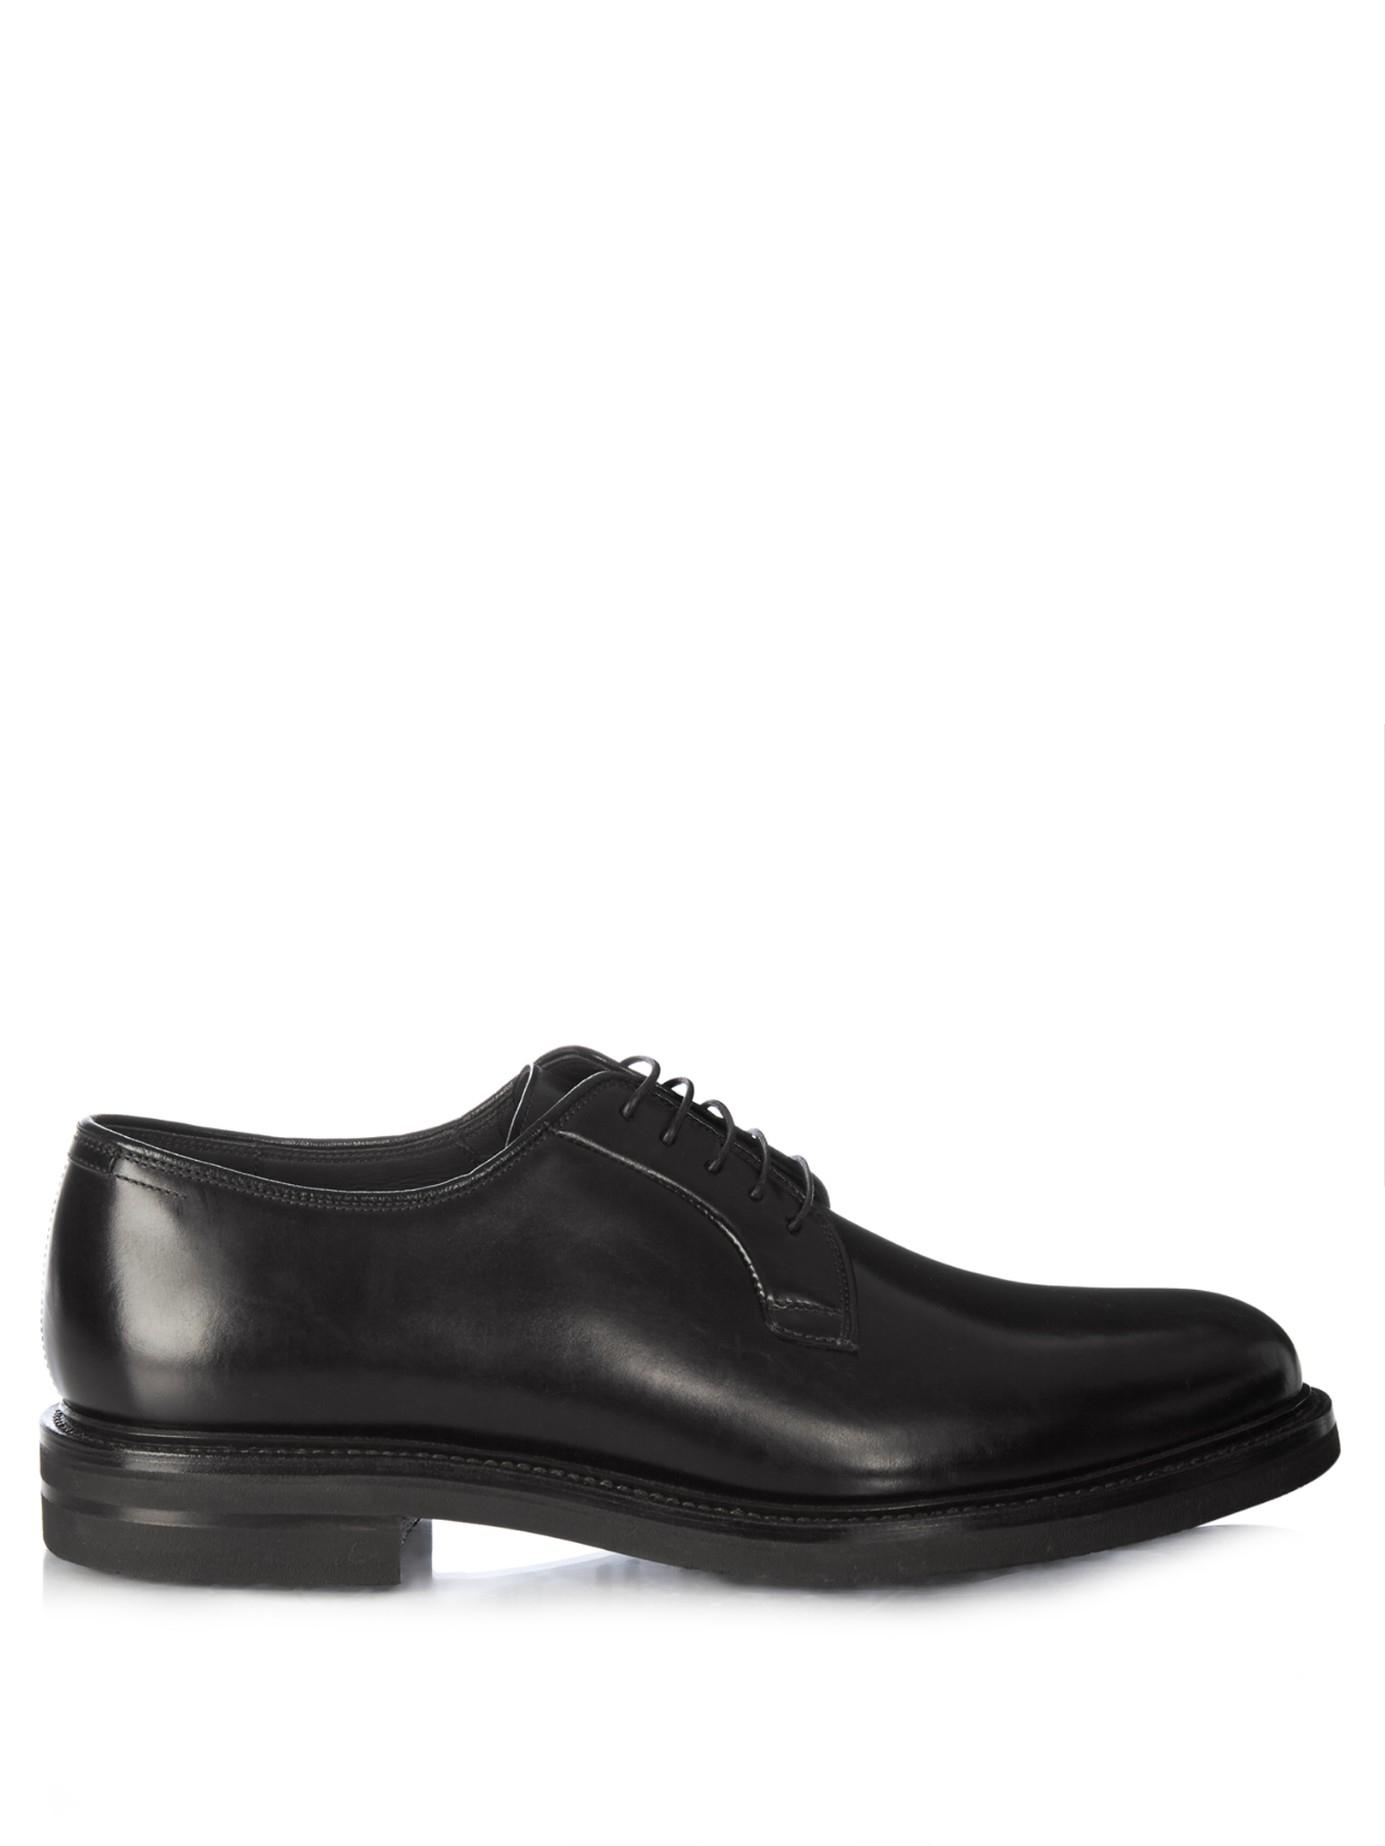 clearance pictures Brunello Cucinelli Leather Monili Oxfords discount marketable bpxsAC8